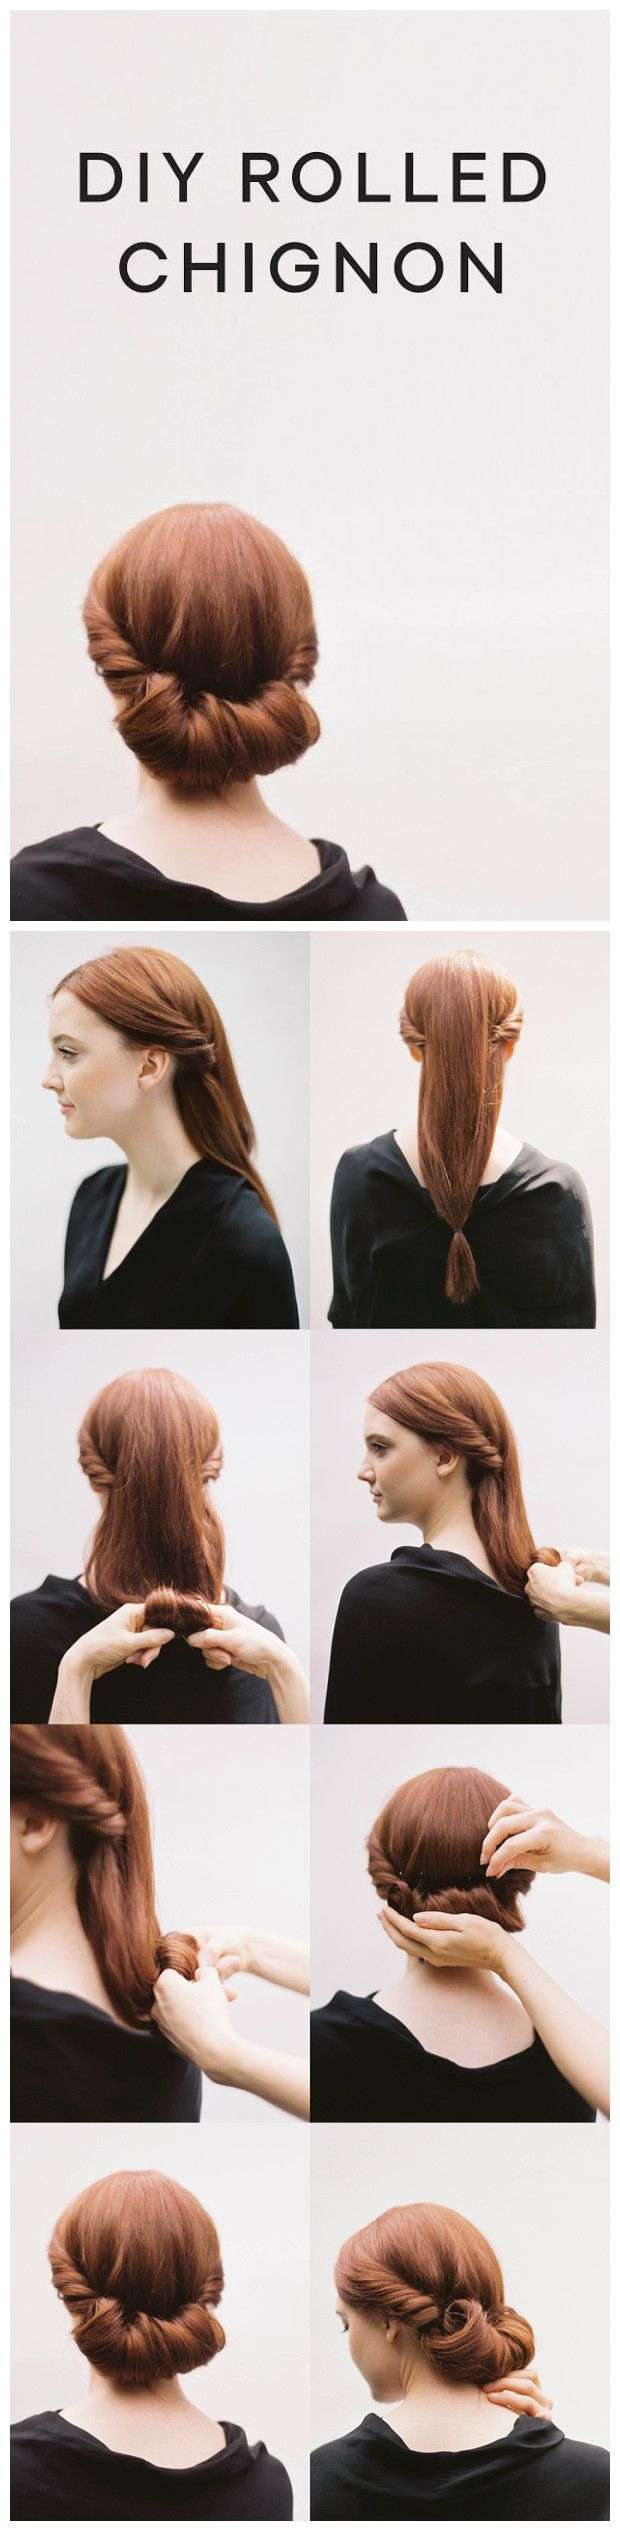 DIY ROLLED CHIGNON HAIR TUTORIAL